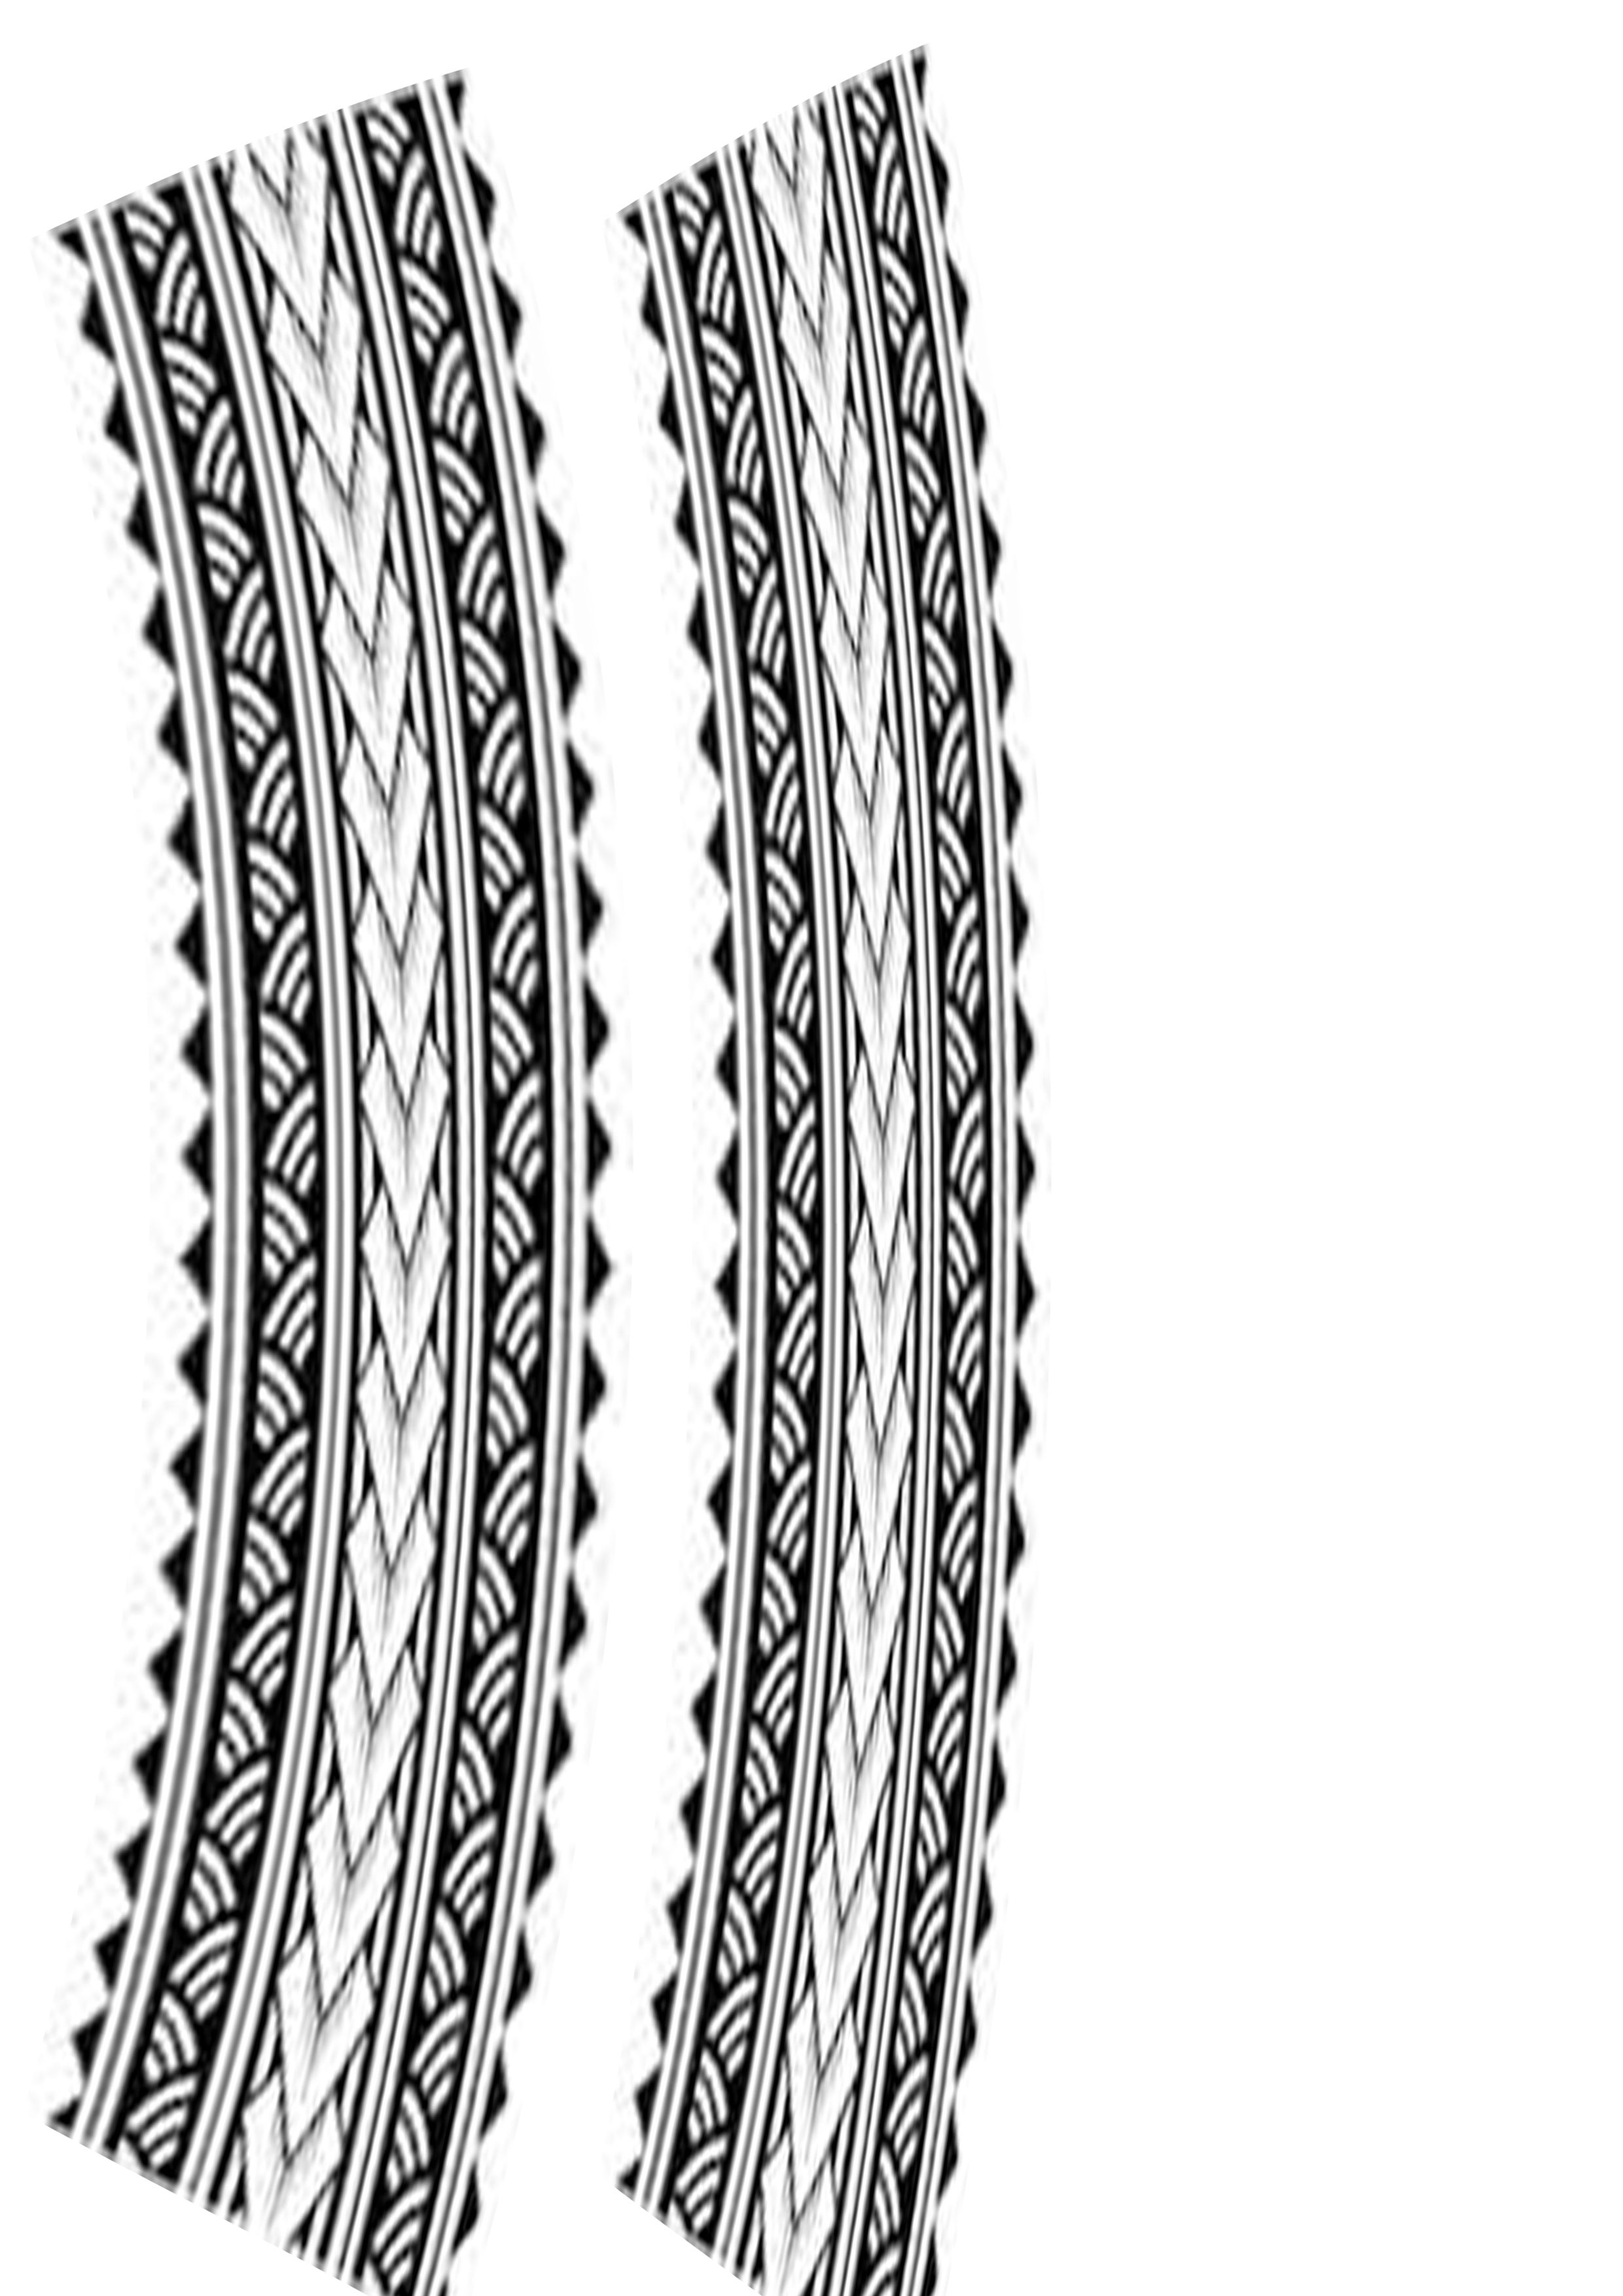 Polynesian Armband Tattoo Stencil : polynesian, armband, tattoo, stencil, Moari, Tattoo, Designs,, Armband, Design,